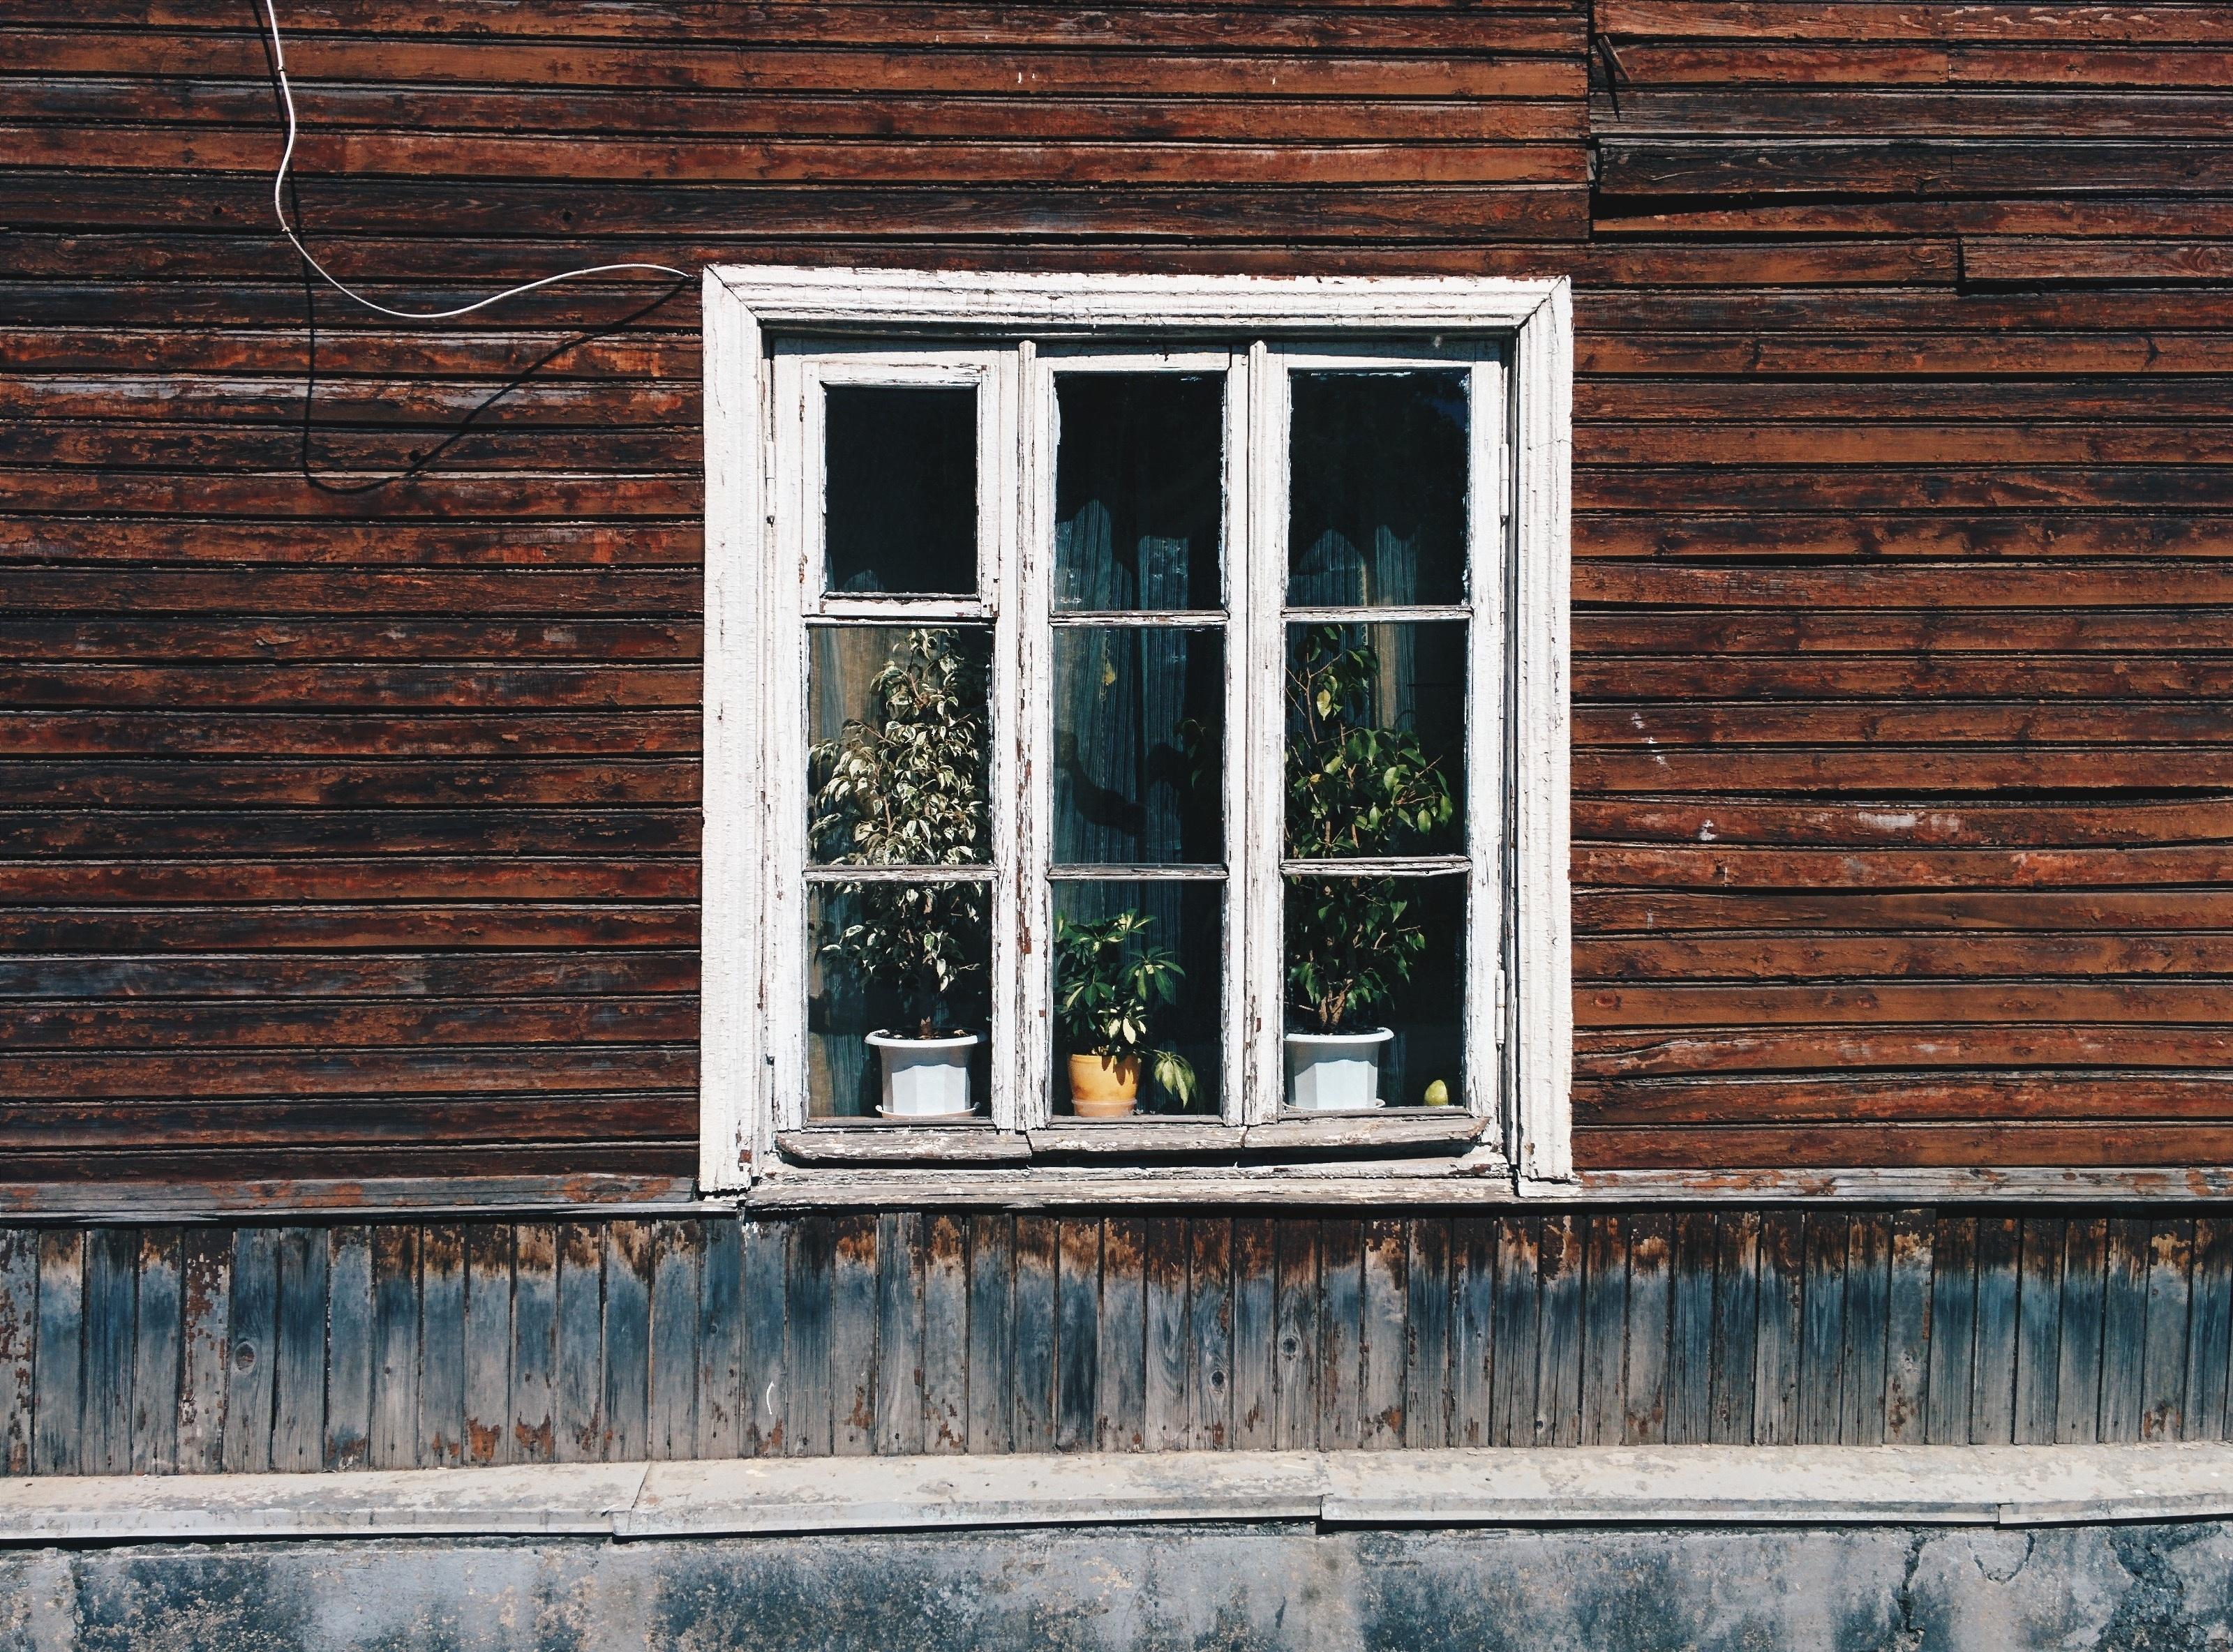 Fotos gratis : vendimia, casa, vaso, edificio, antiguo, granero ...